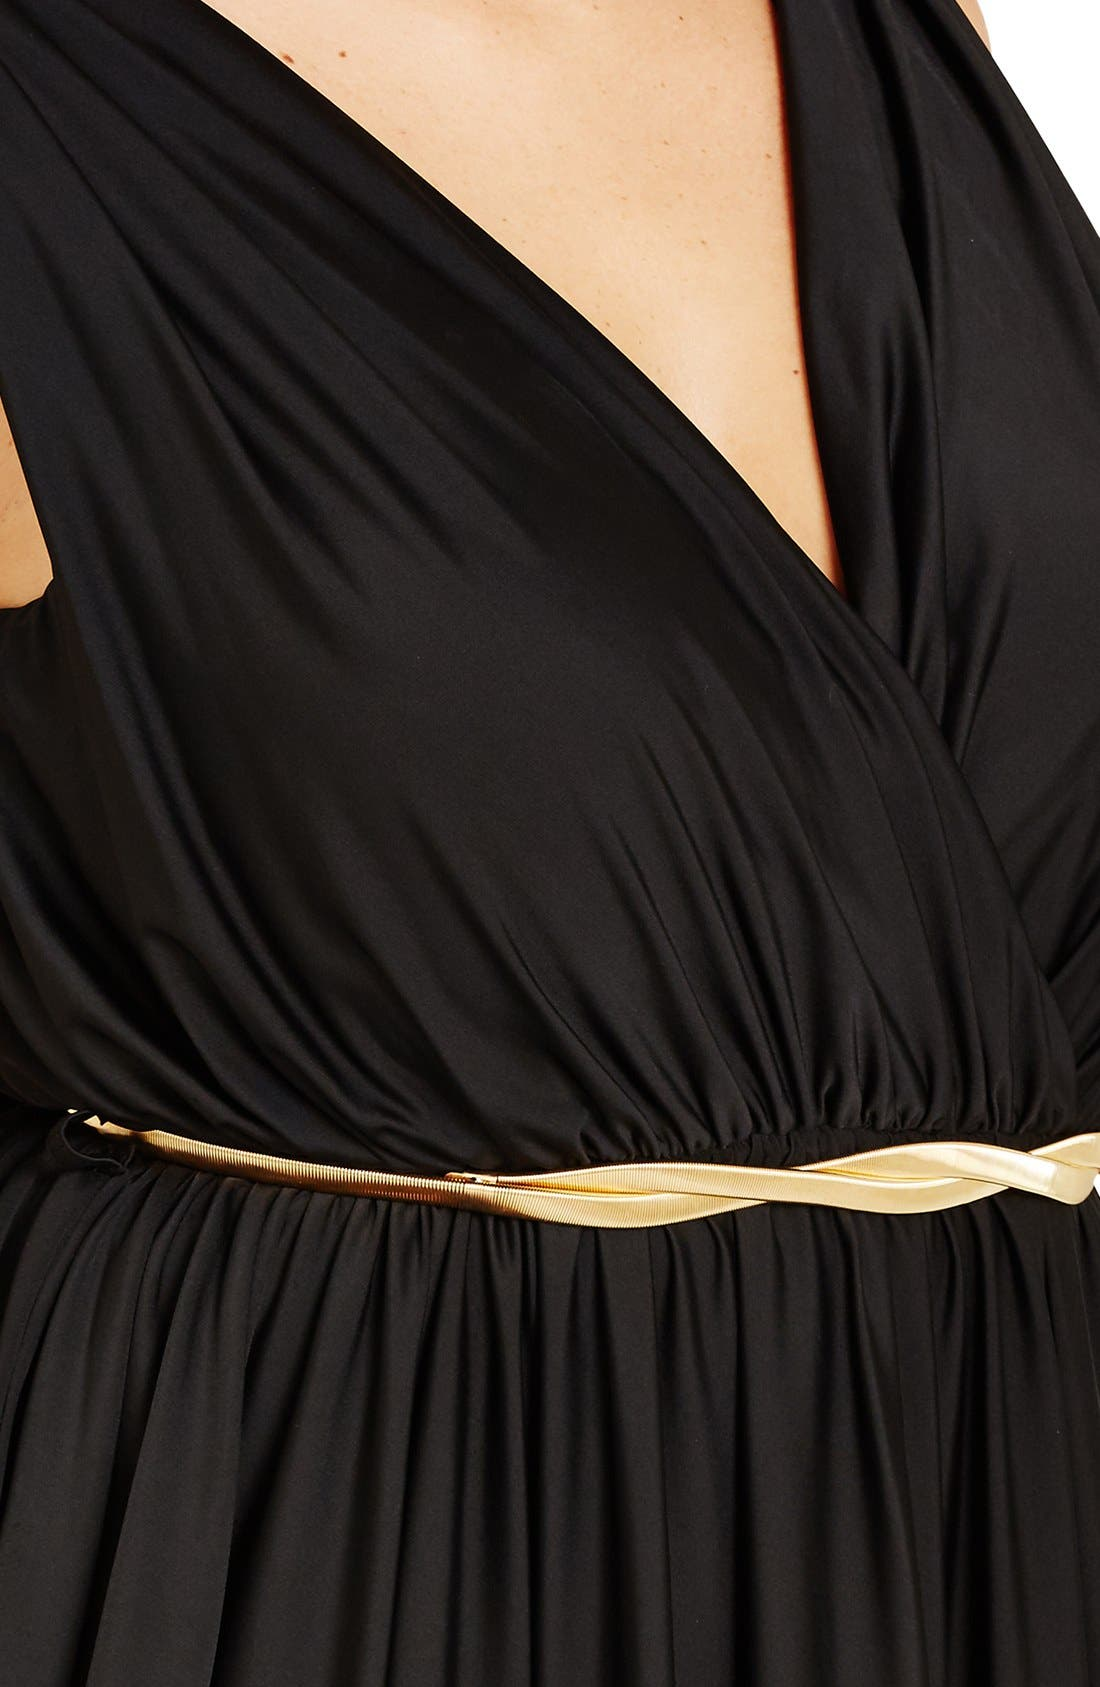 Alternate Image 3  - City Chic 'Athena Goddess' Maxi Dress (Plus Size)